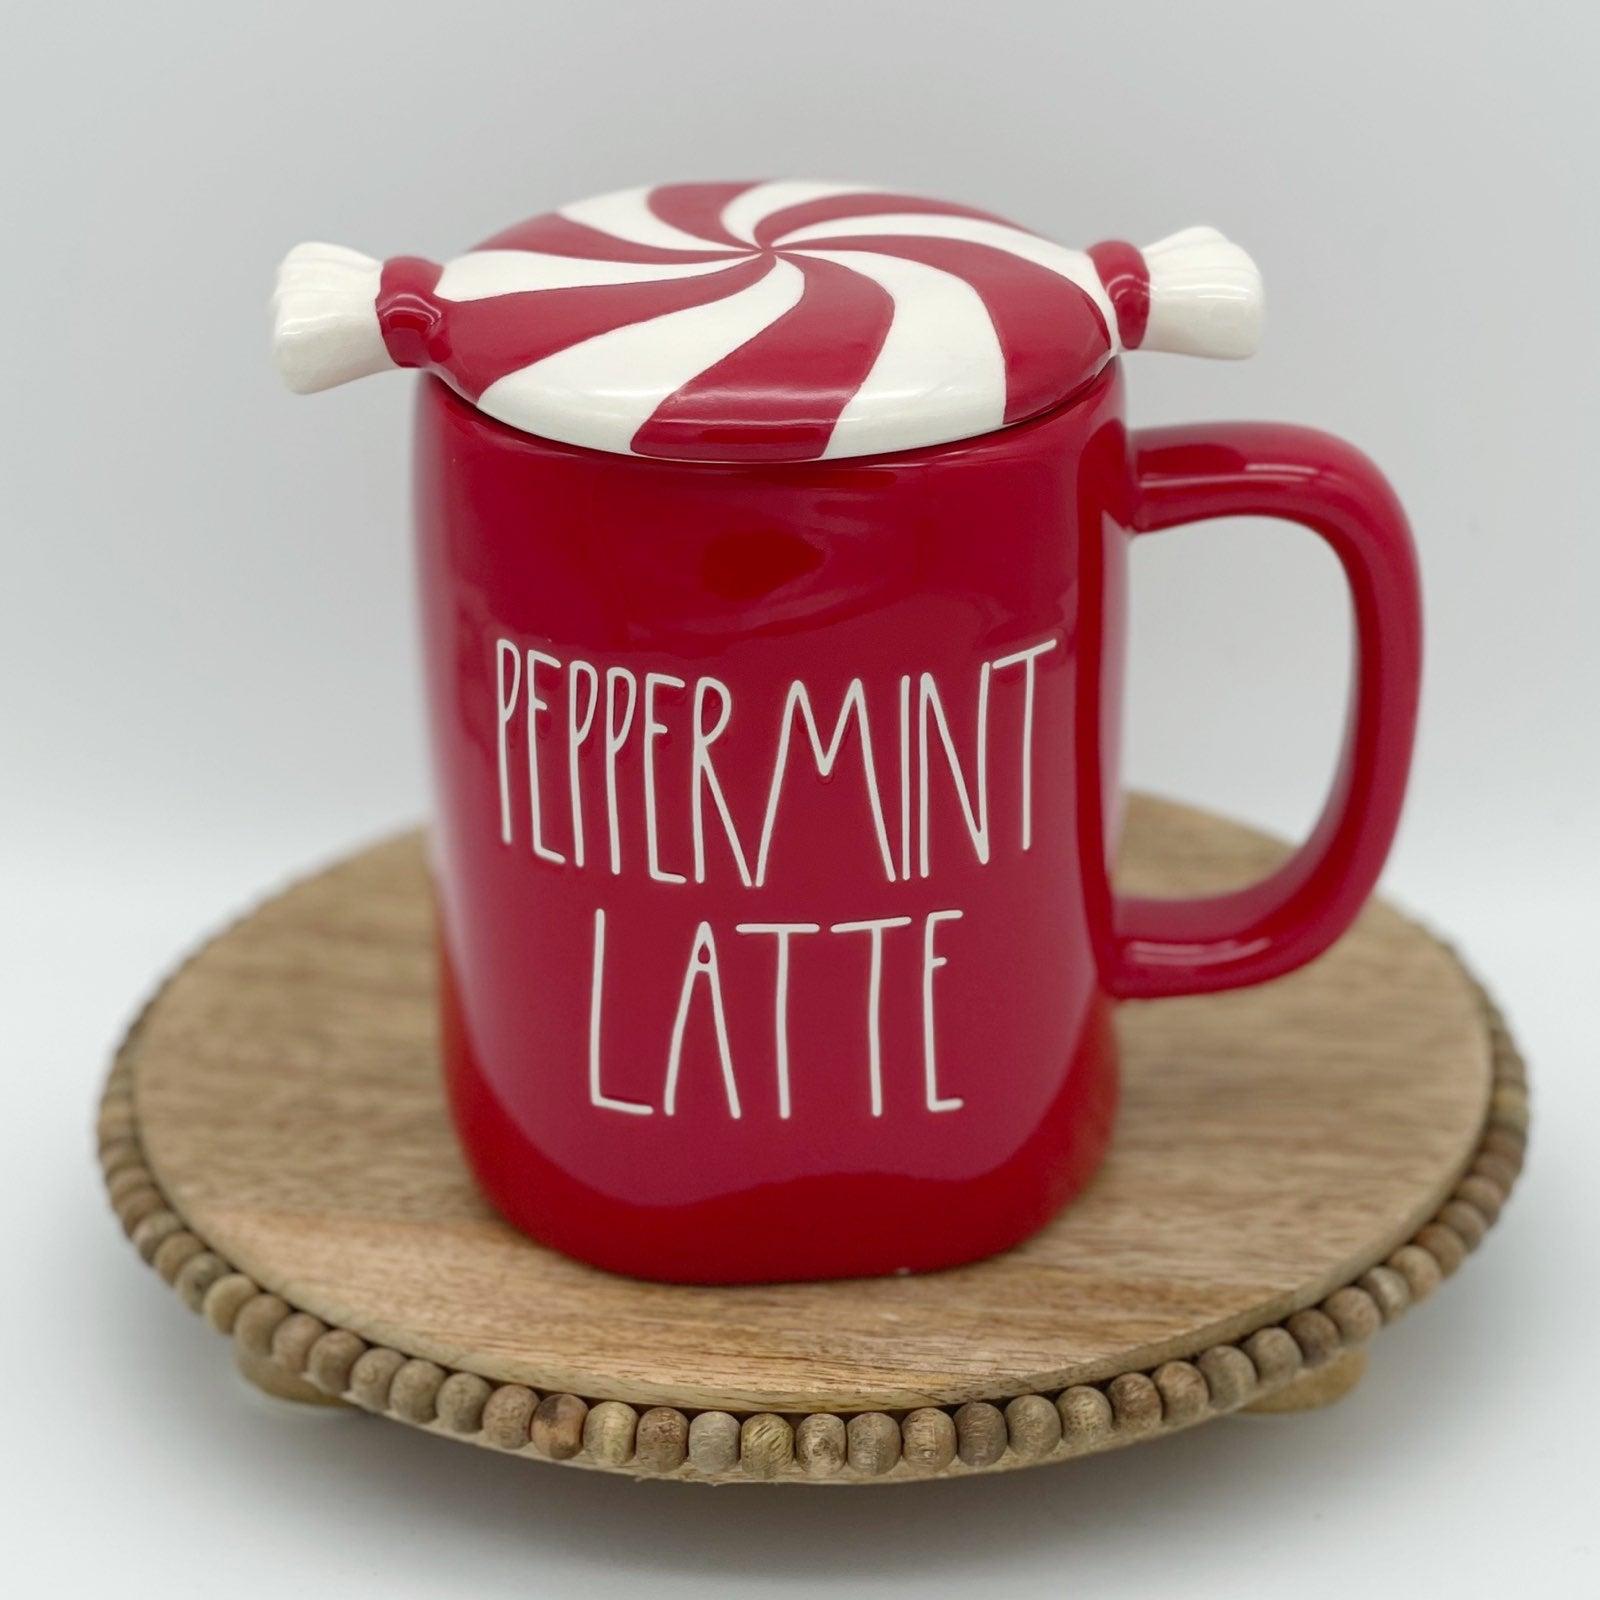 Rae Dunn peppermint latte mug